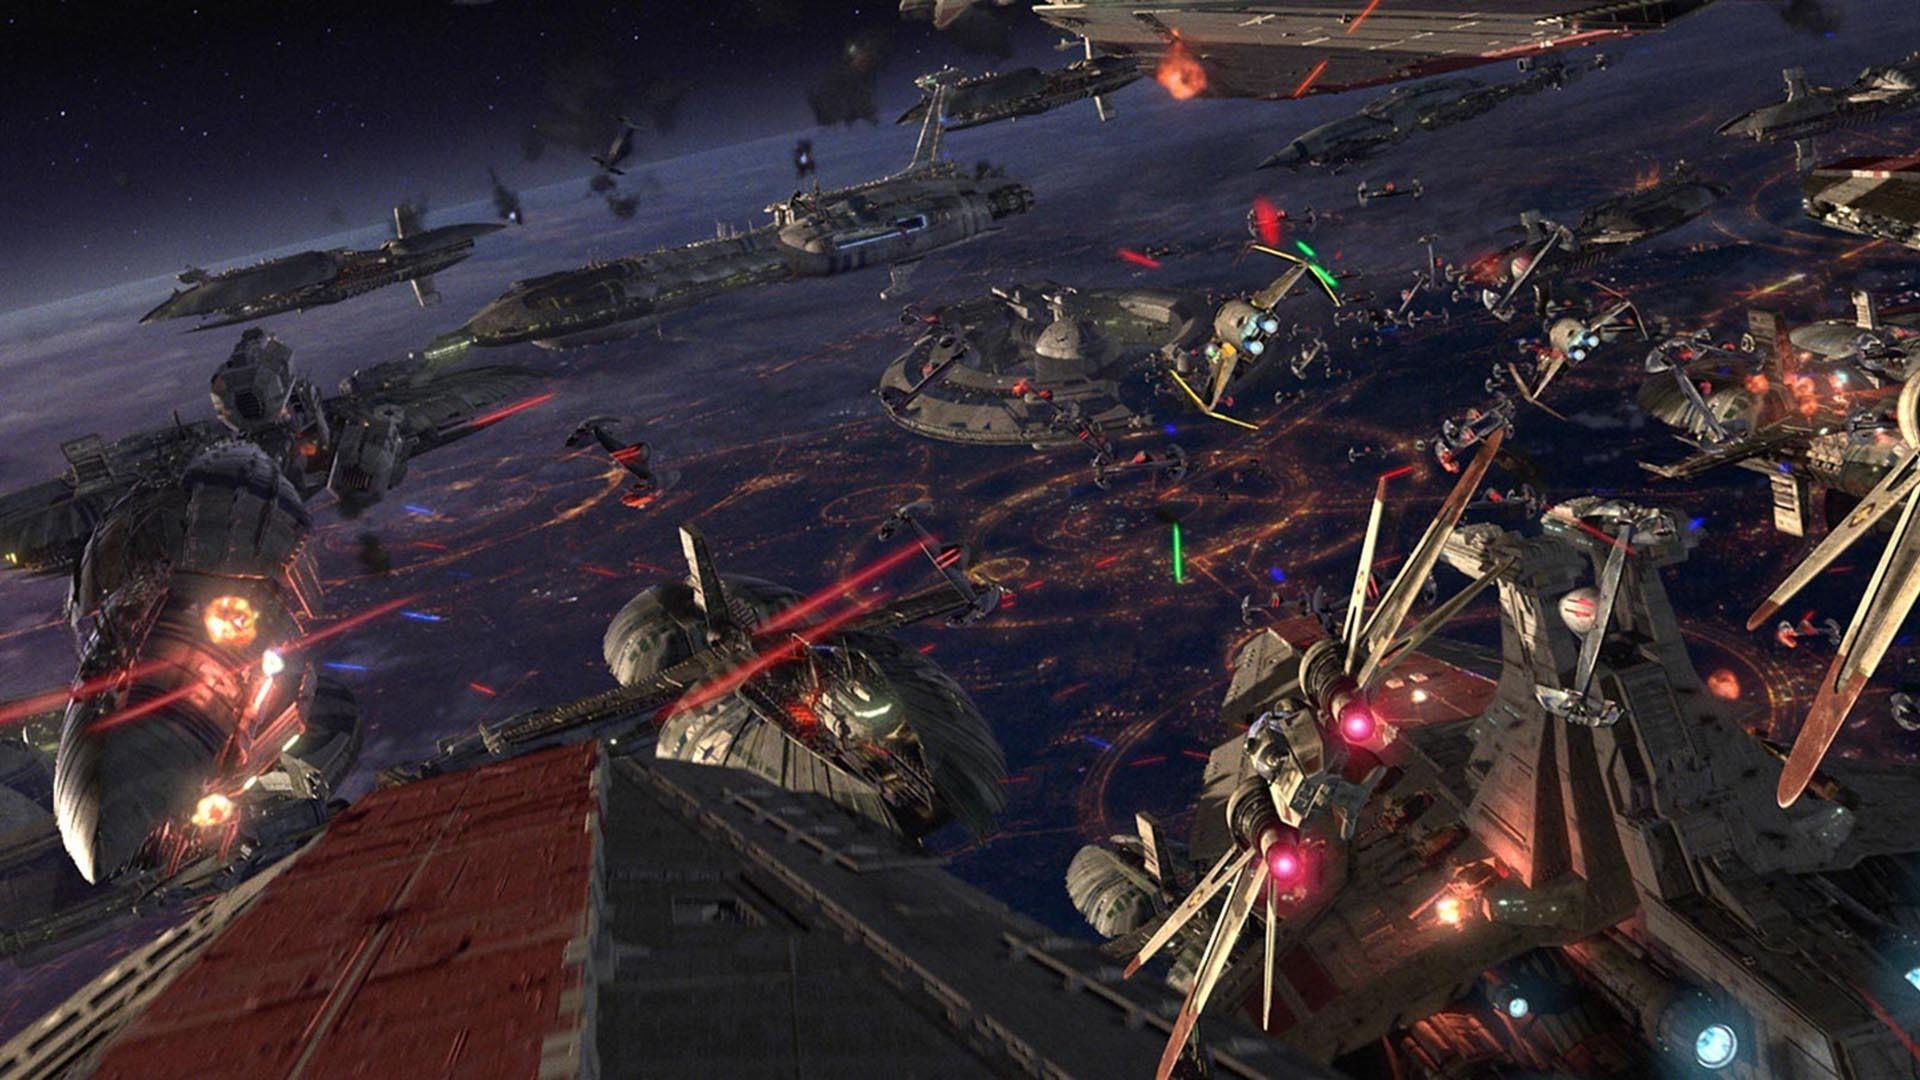 Star Wars Episode III Revenge of the Sith sci fi battle spaceship 1920x1080